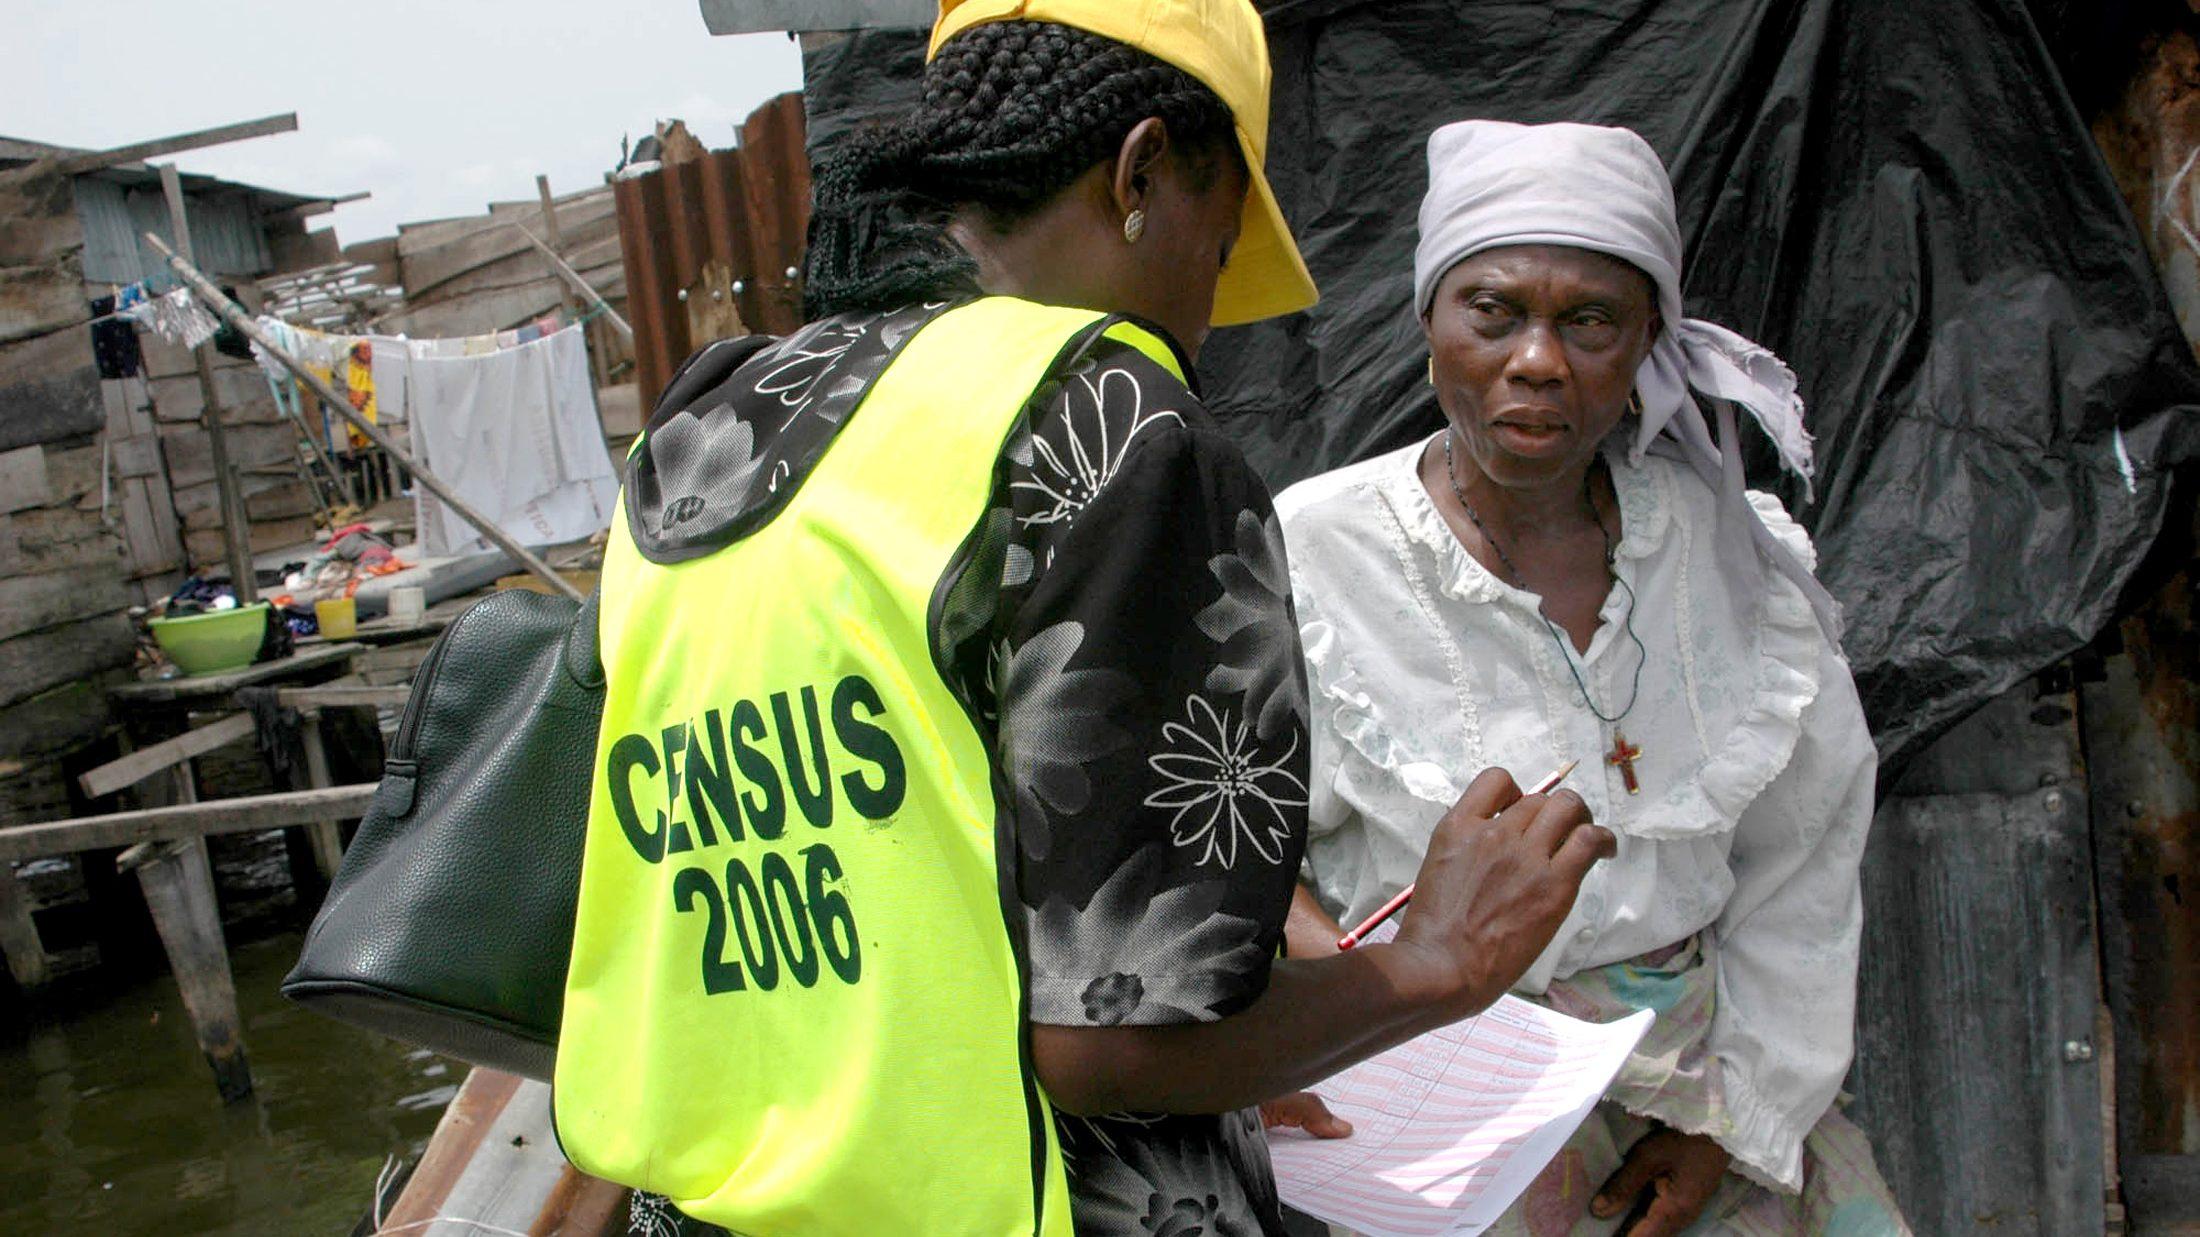 Africa has a data problem says Mo Ibrahim Governance Report